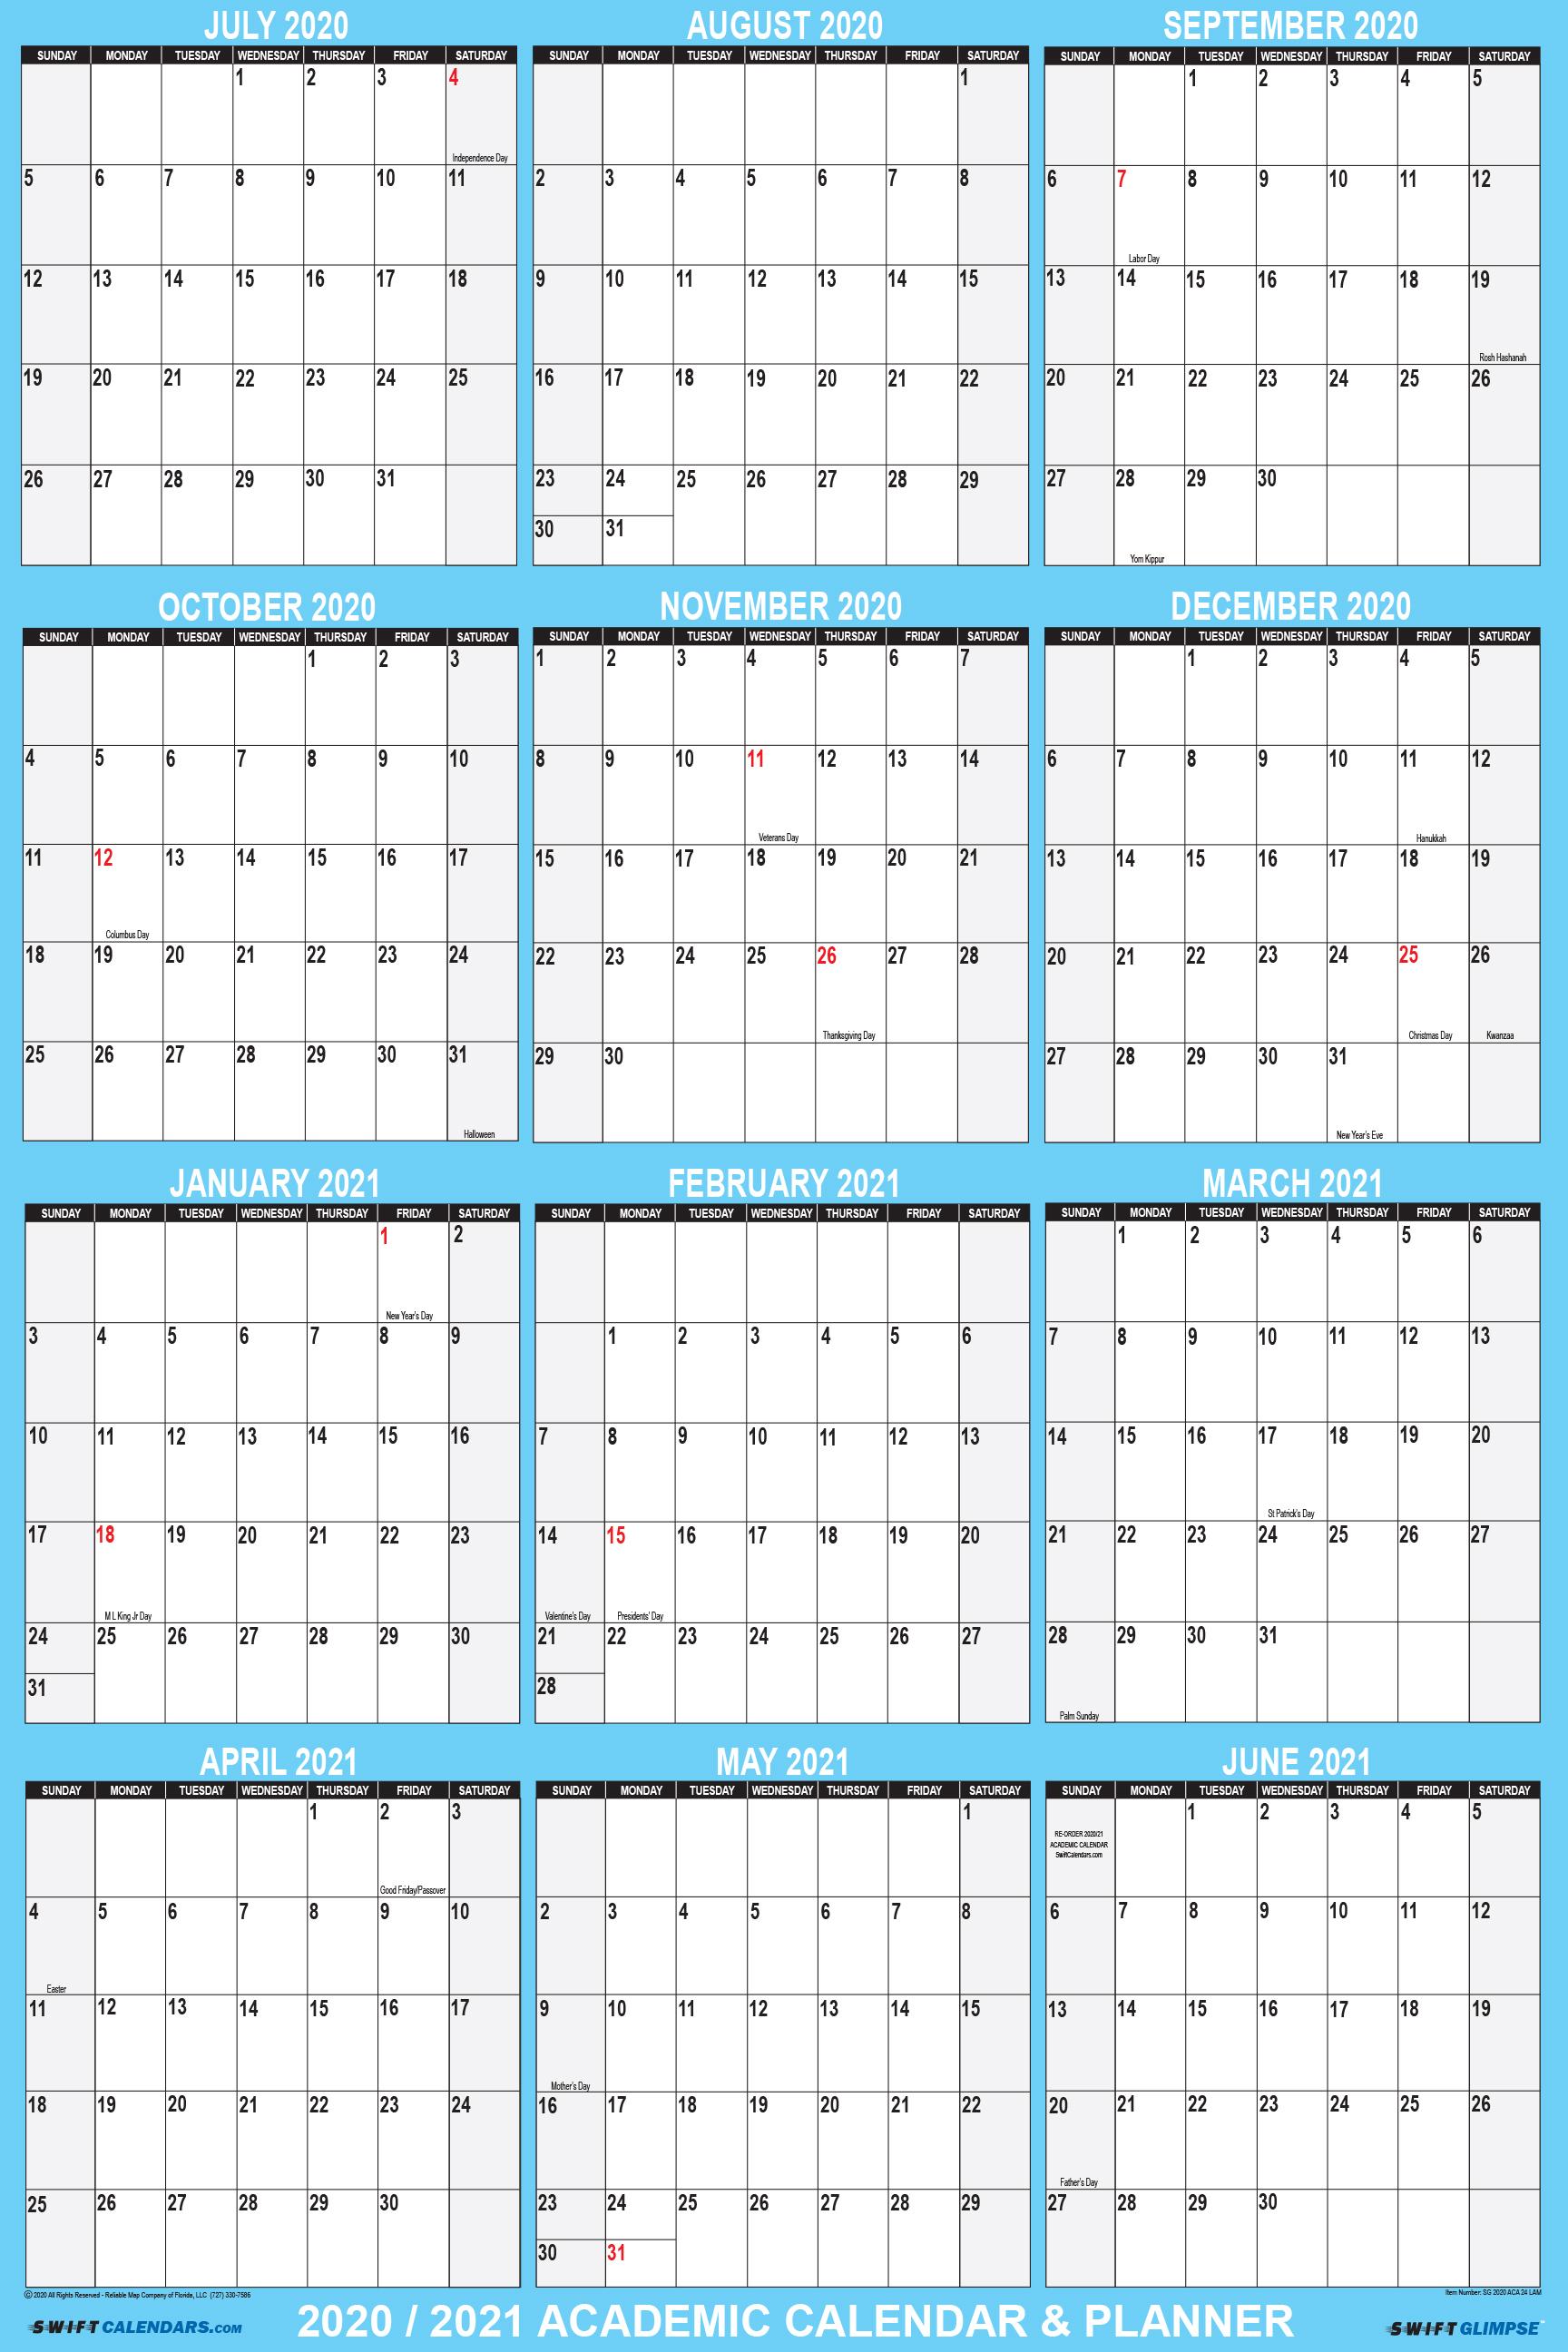 2021 Planning Calendar 2020 2021 Academic Planning Calendar 24